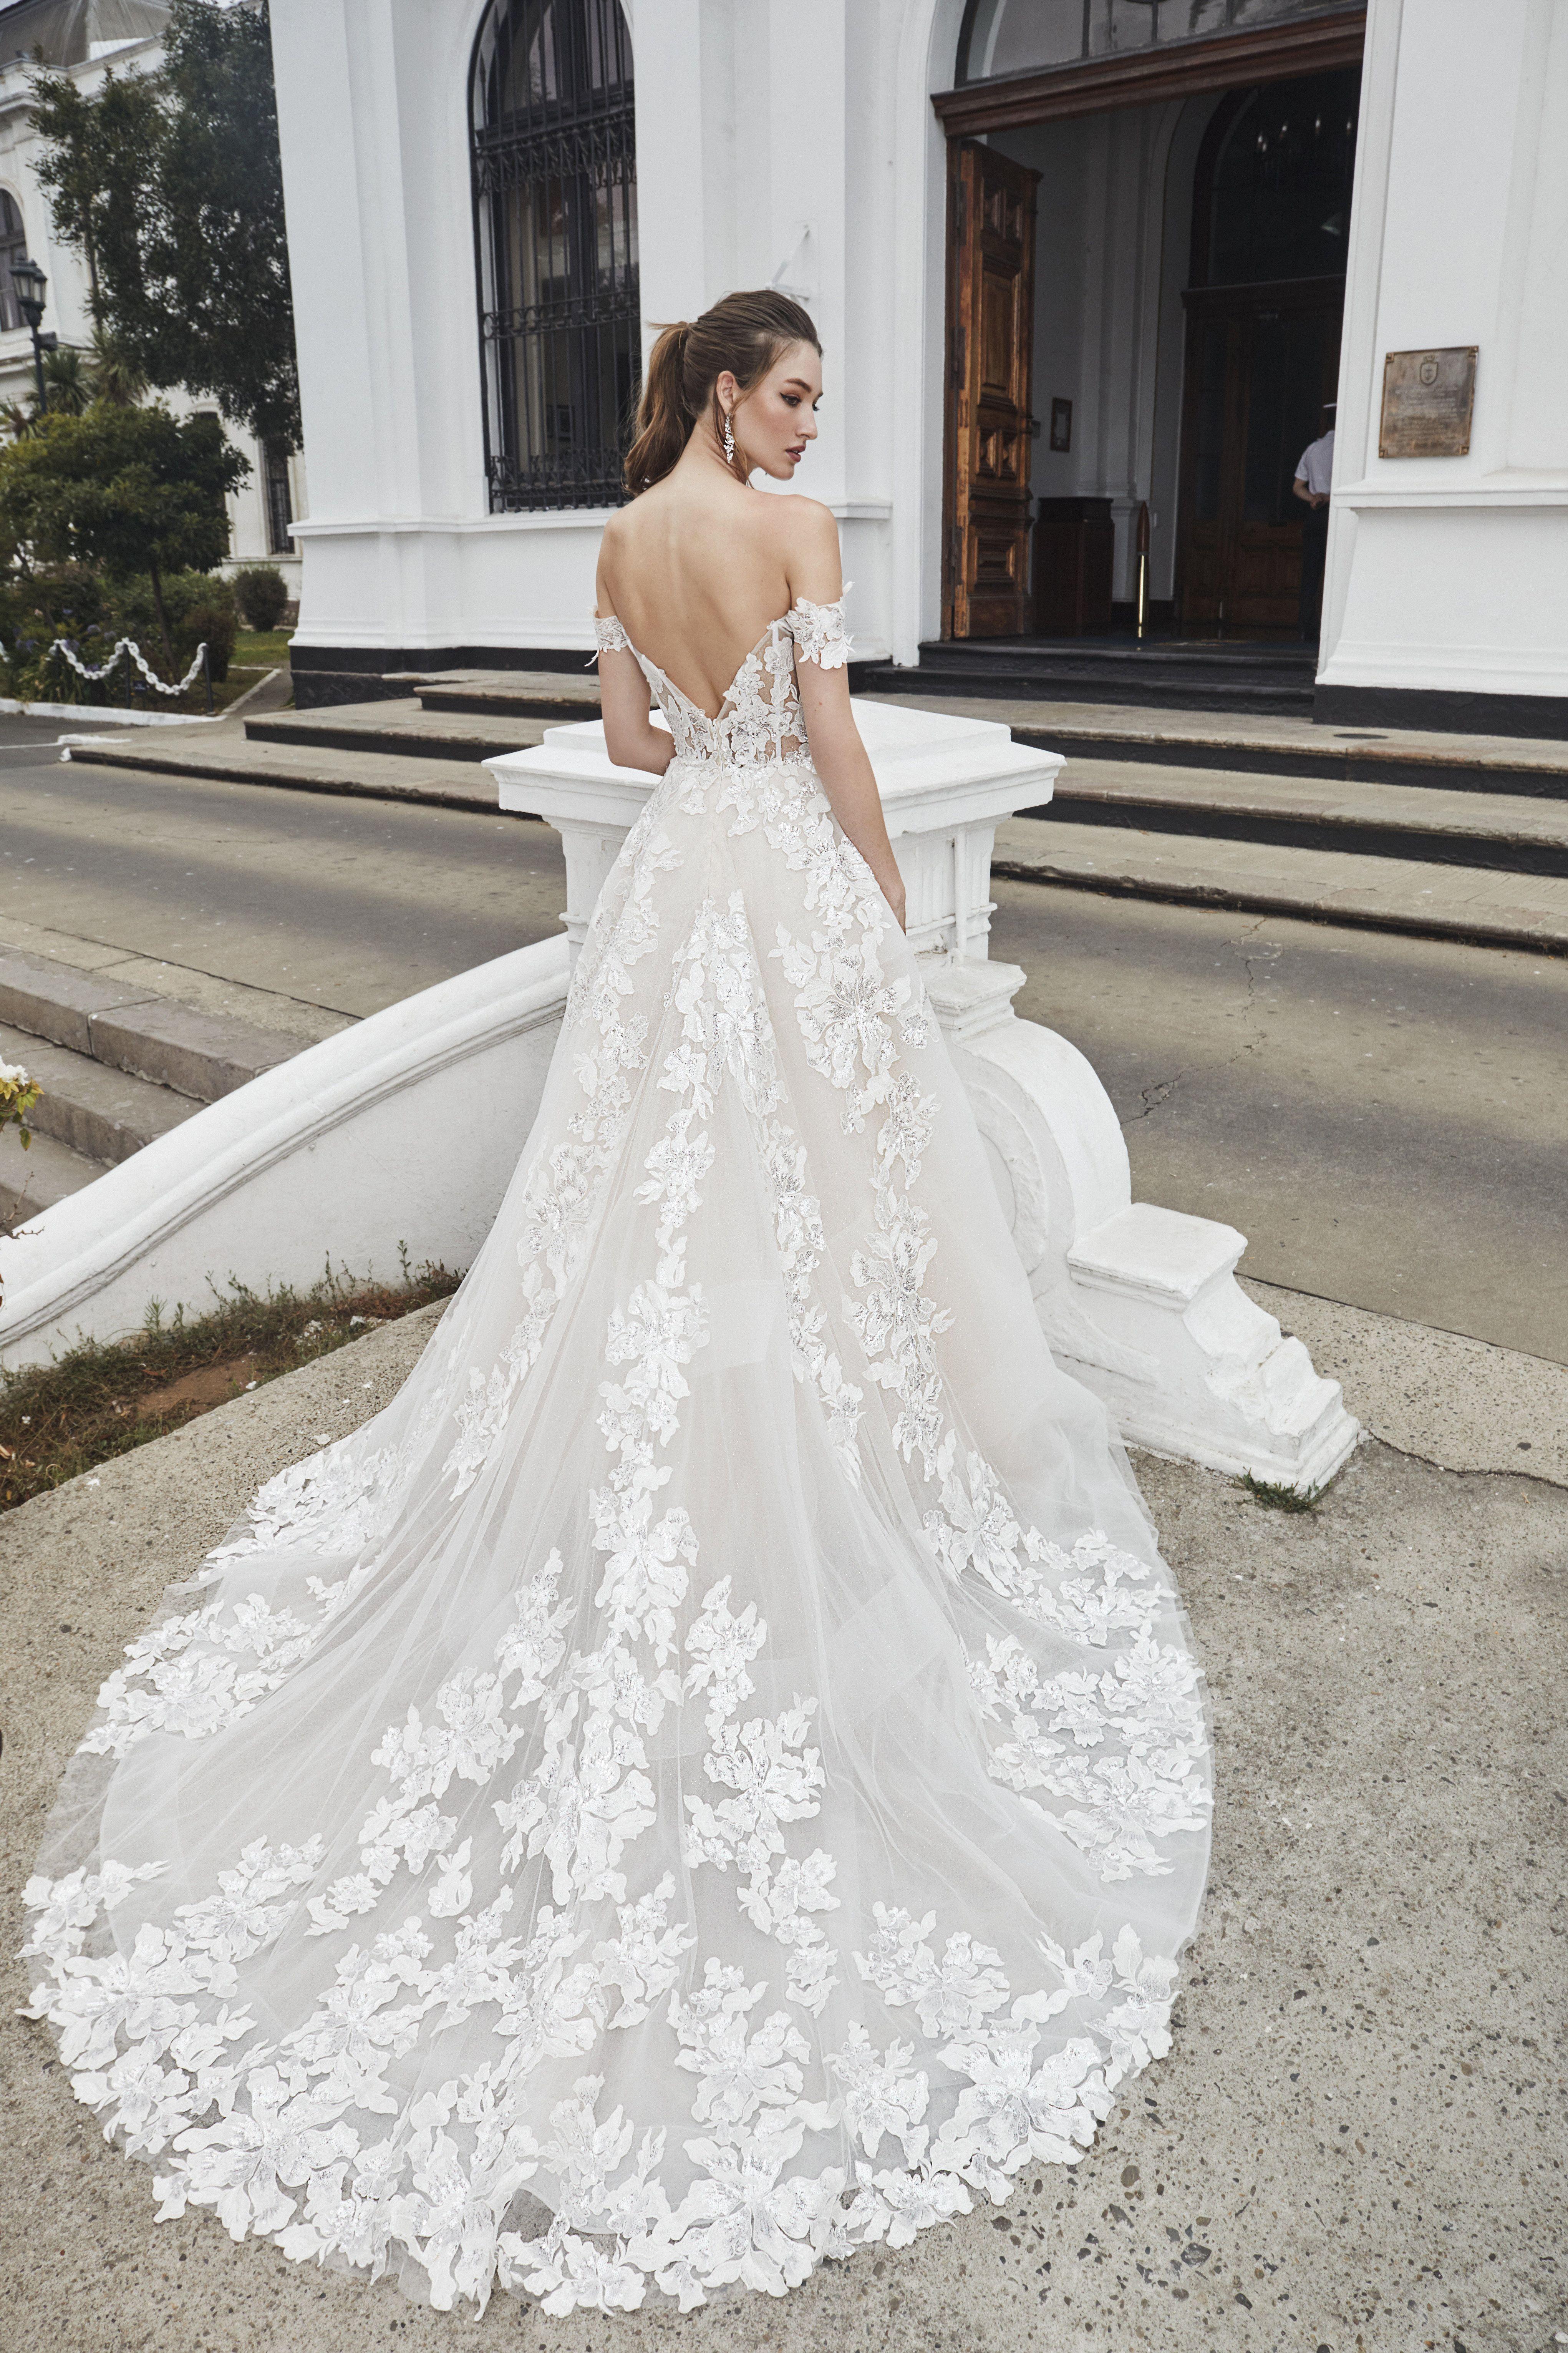 Marcella Wedding Dresses Bridal Gowns Kittychen Couture Wedding Dresses Wedding Dress Couture Affordable Wedding Dresses